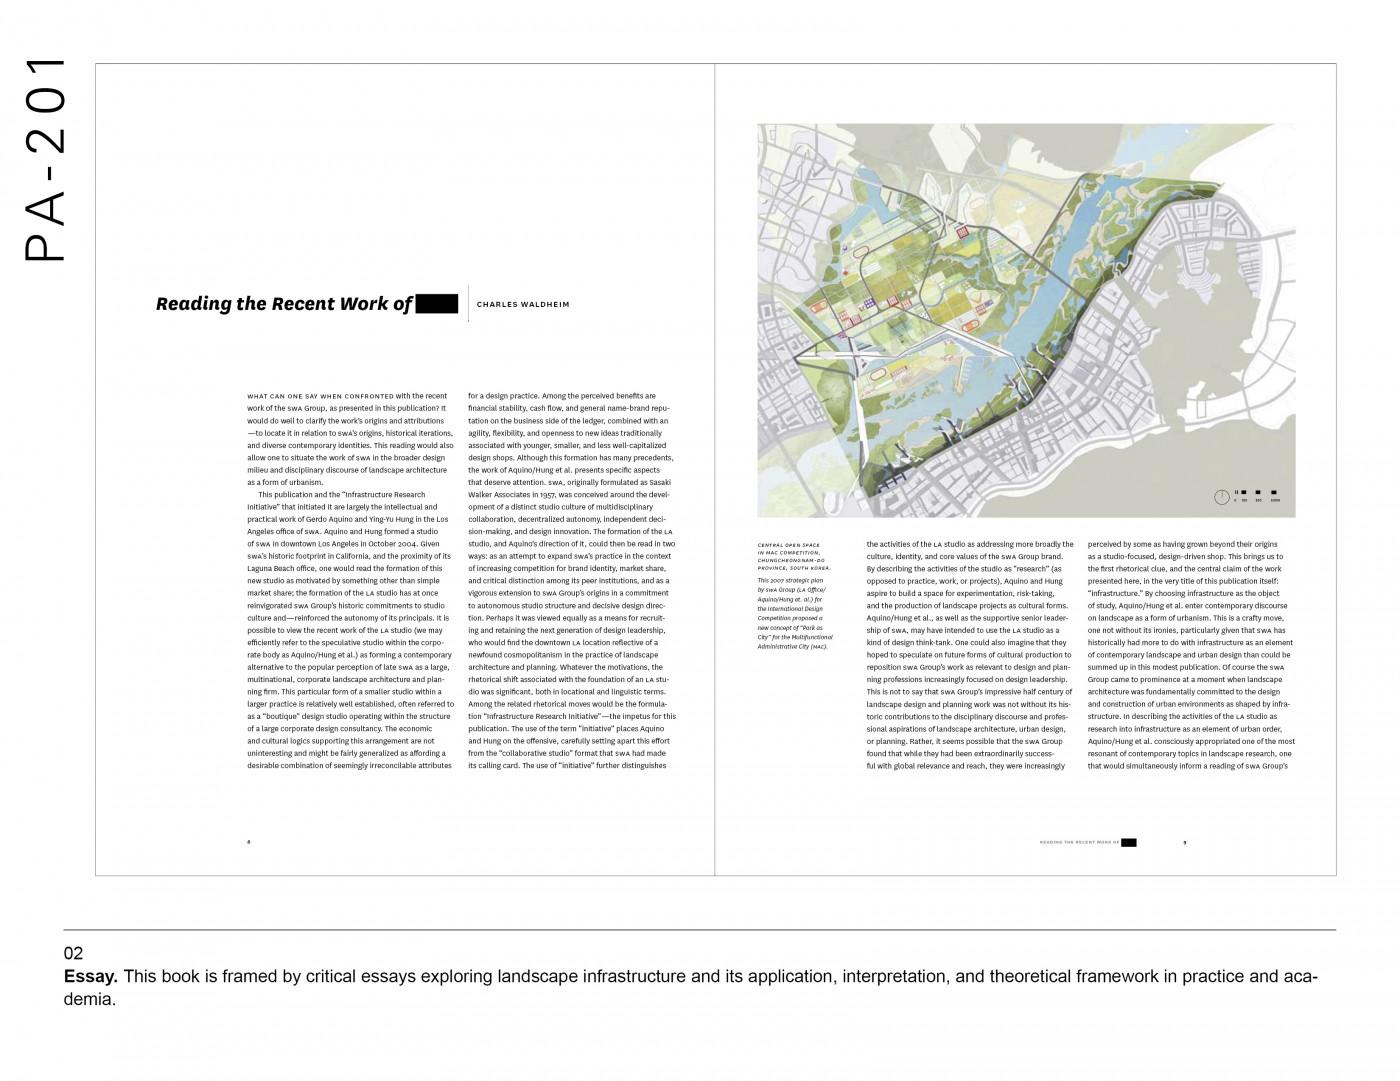 003 Landscape Architecture Essay Example 201 02 Stunning Argumentative Topics 1400